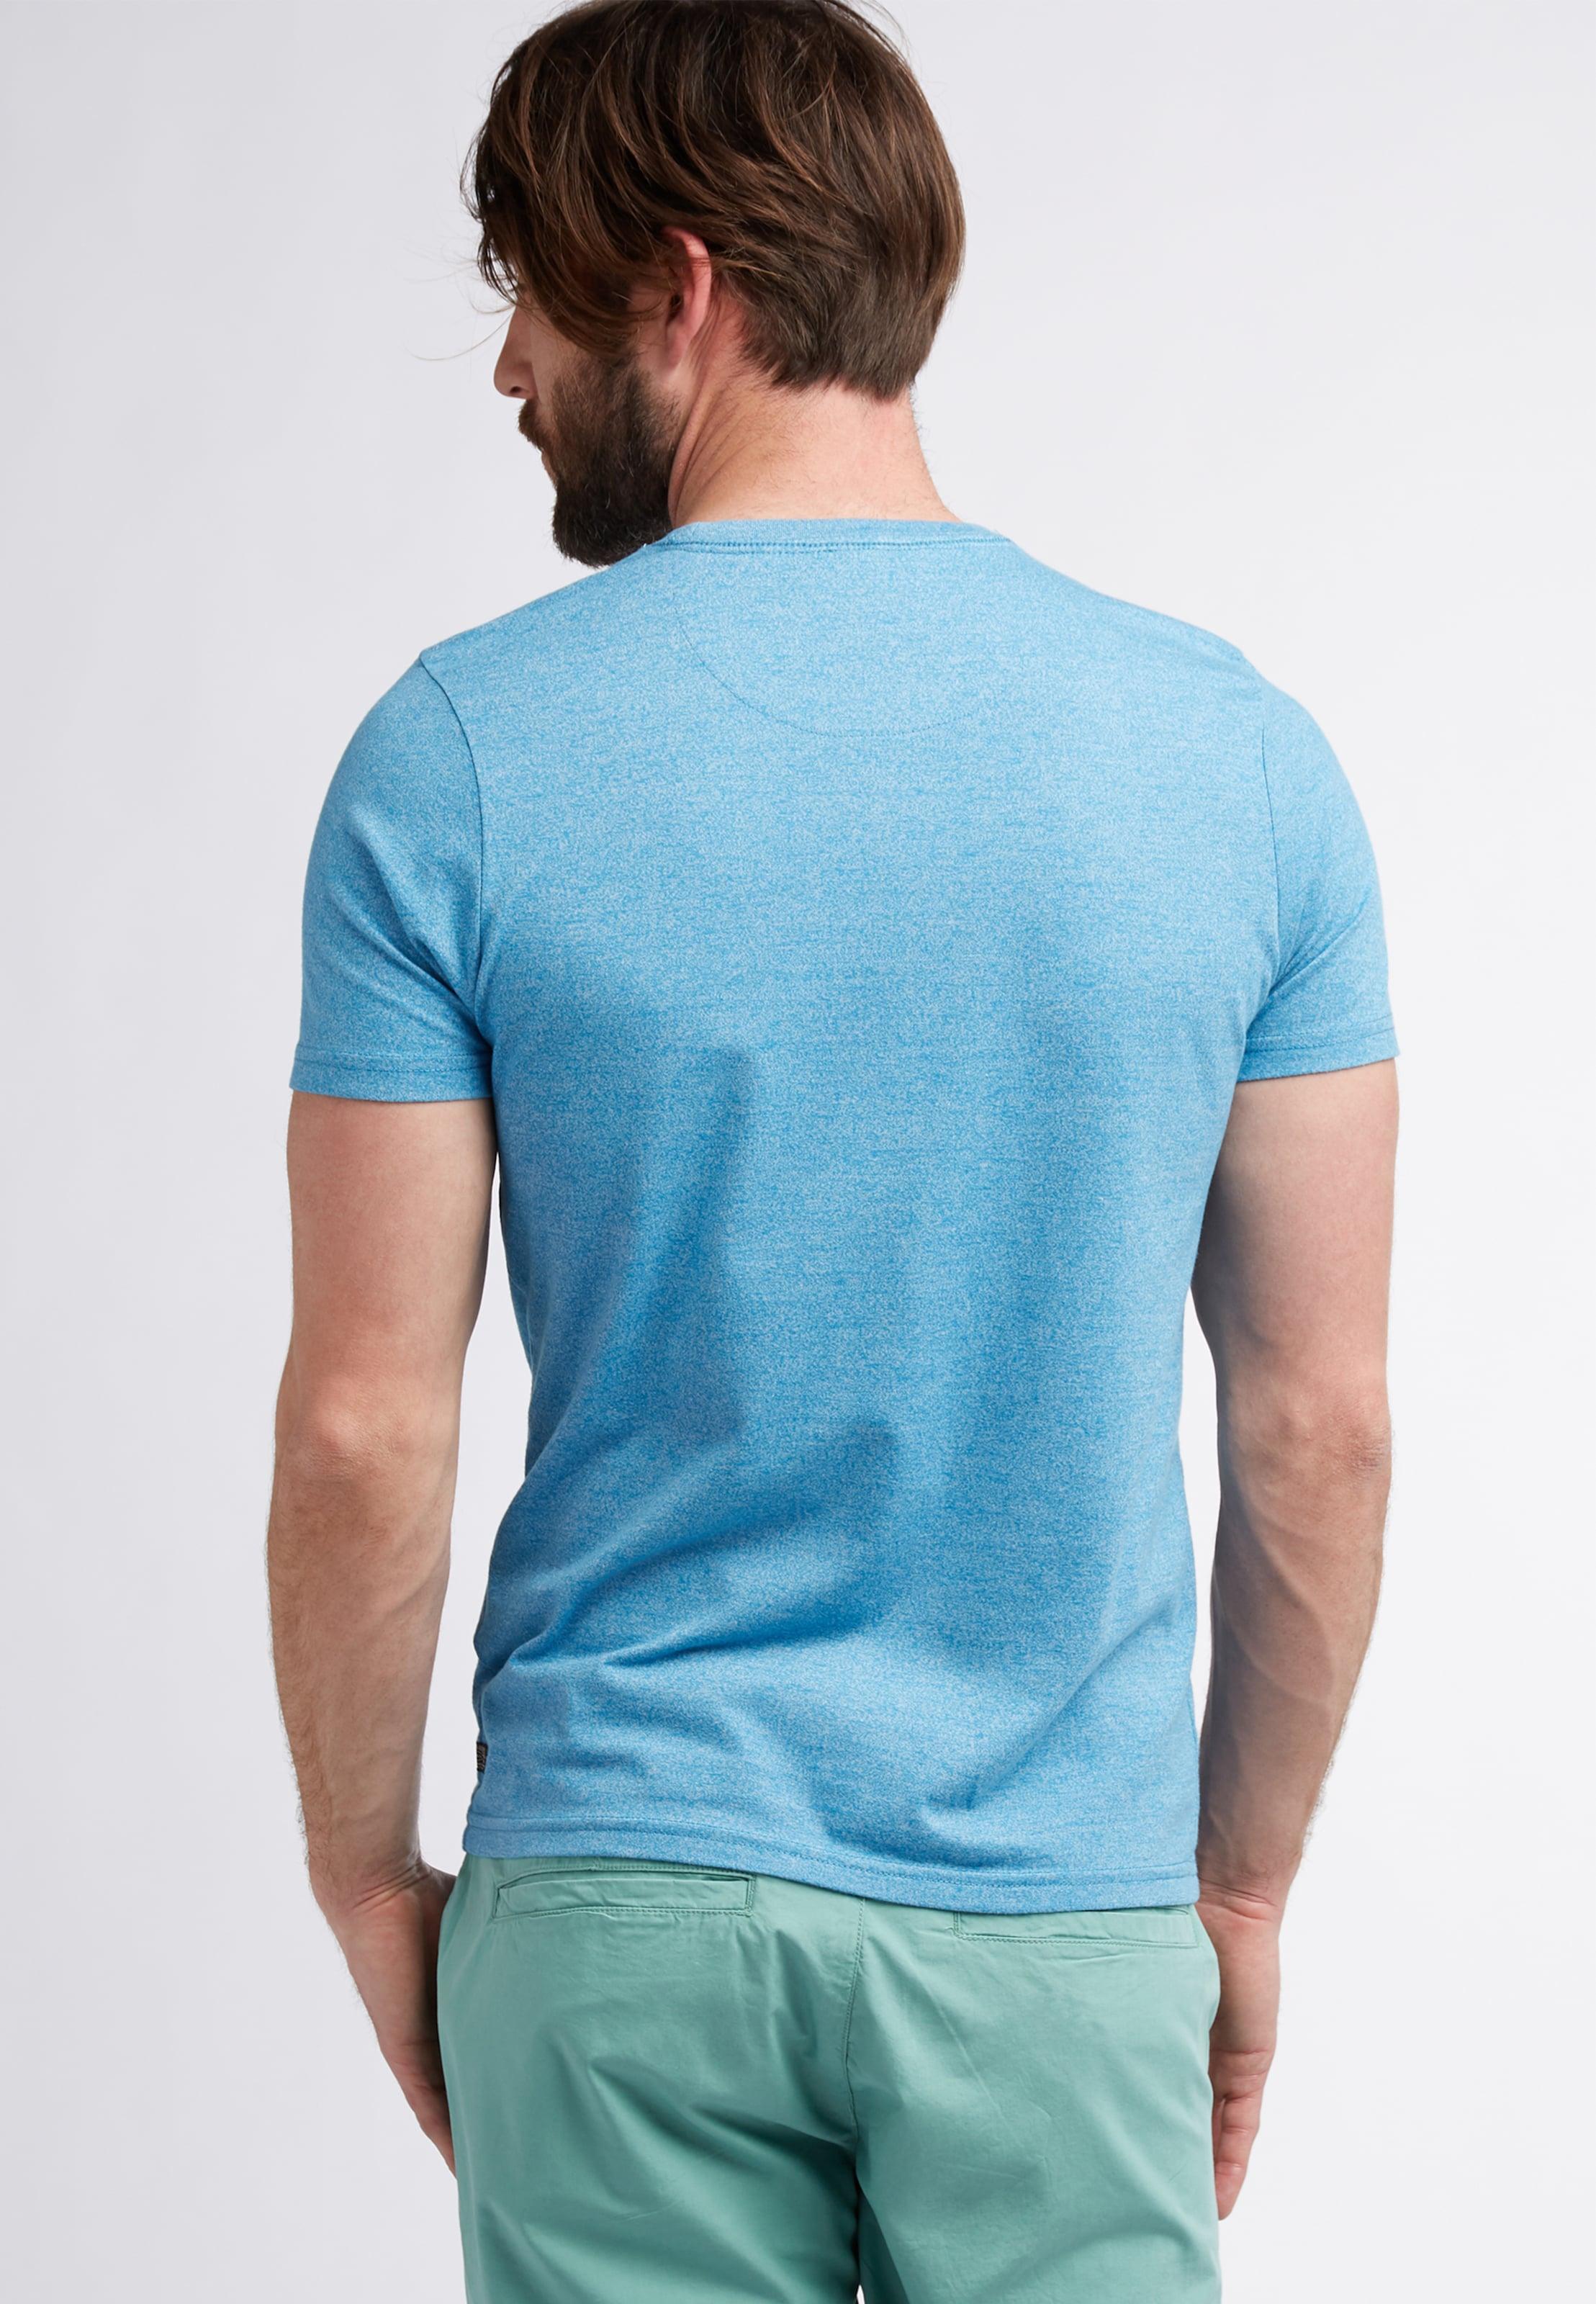 T shirt Industries Petrol TurquoiseBlanc En 8n0myvONw